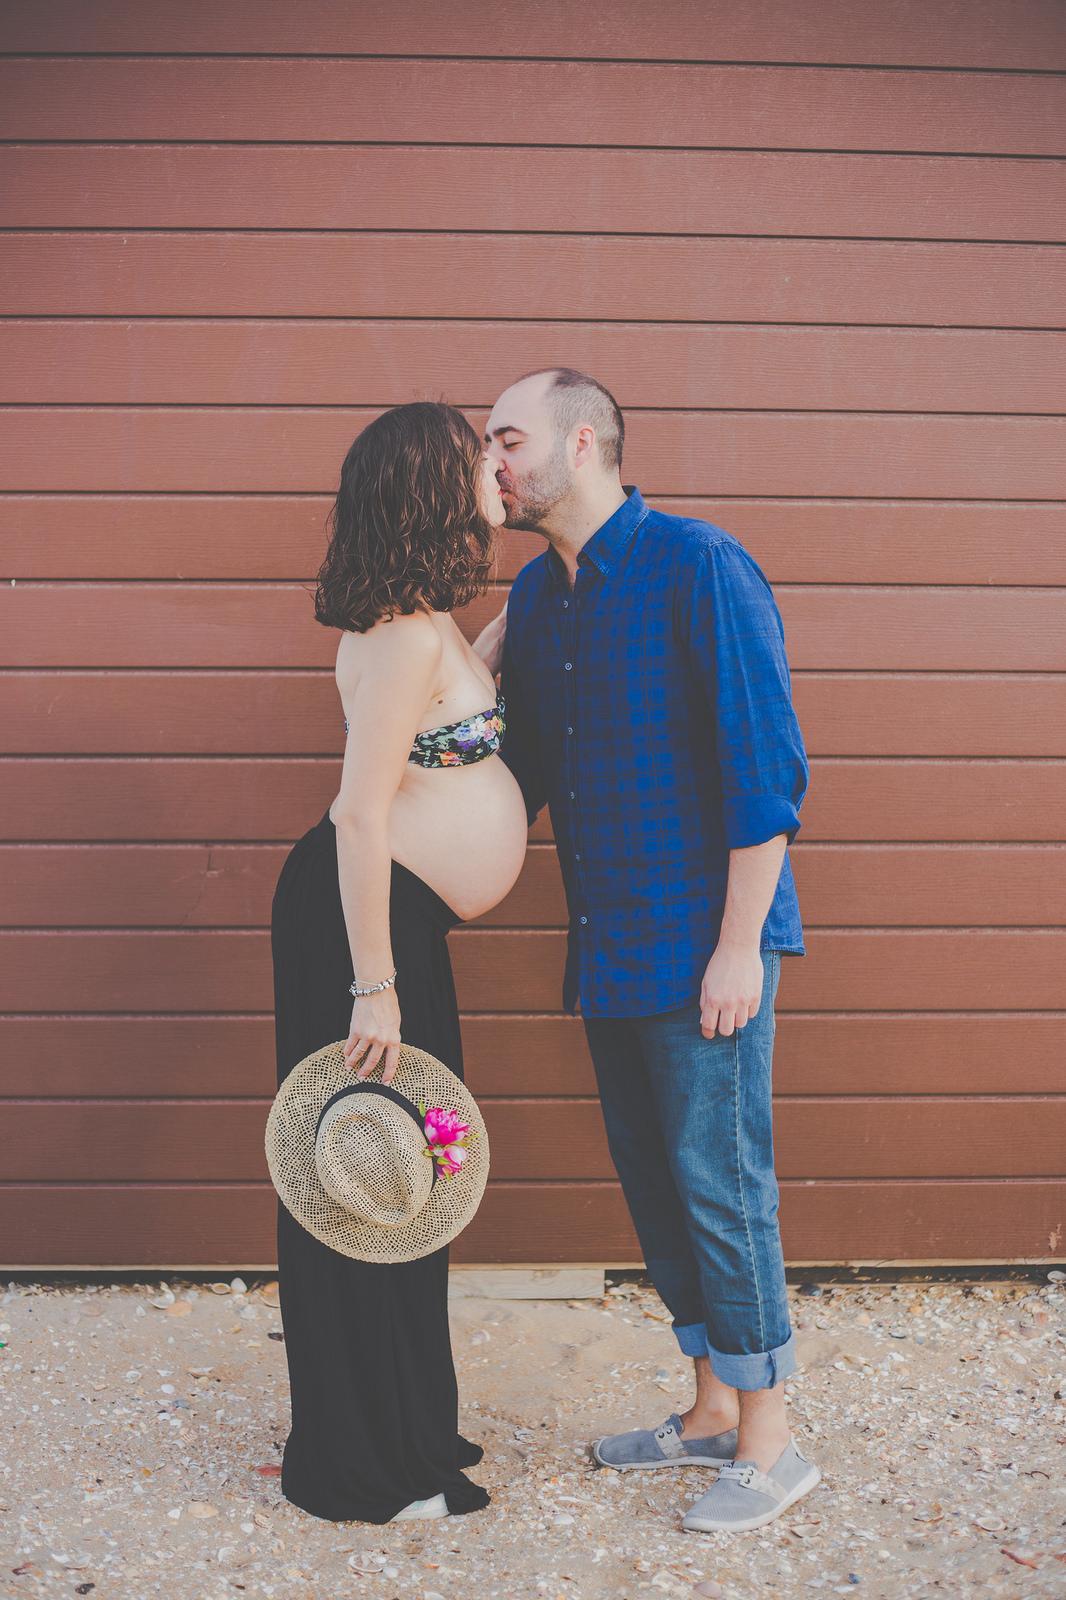 sesion embarazo silvia orduna fotografia huelva playa 30